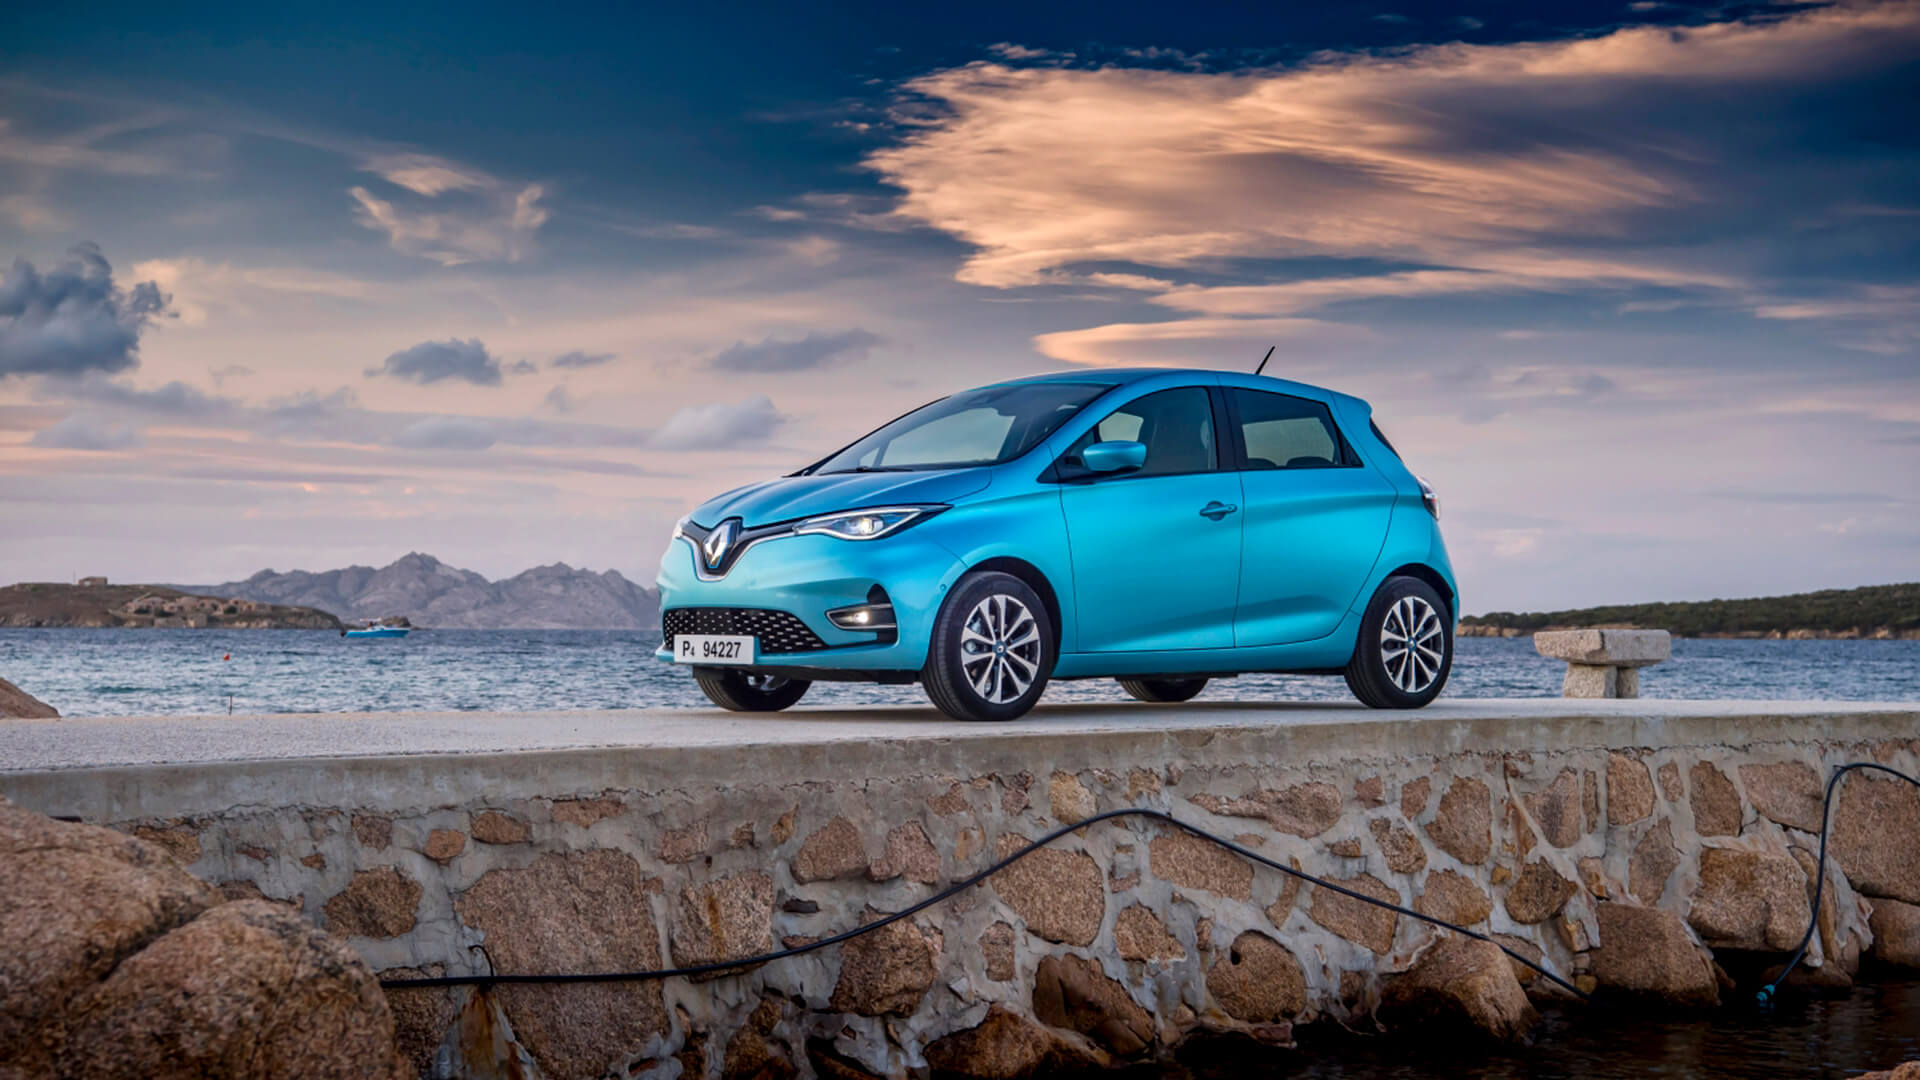 Продажи Renault ZOE в Европе составили более 200 000 единиц